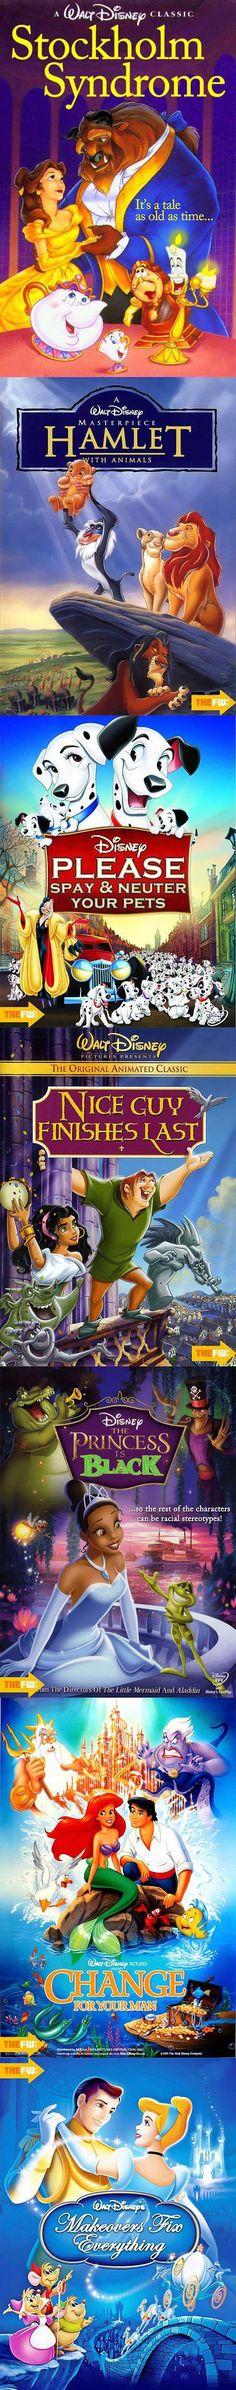 Alternate Disney film titles.